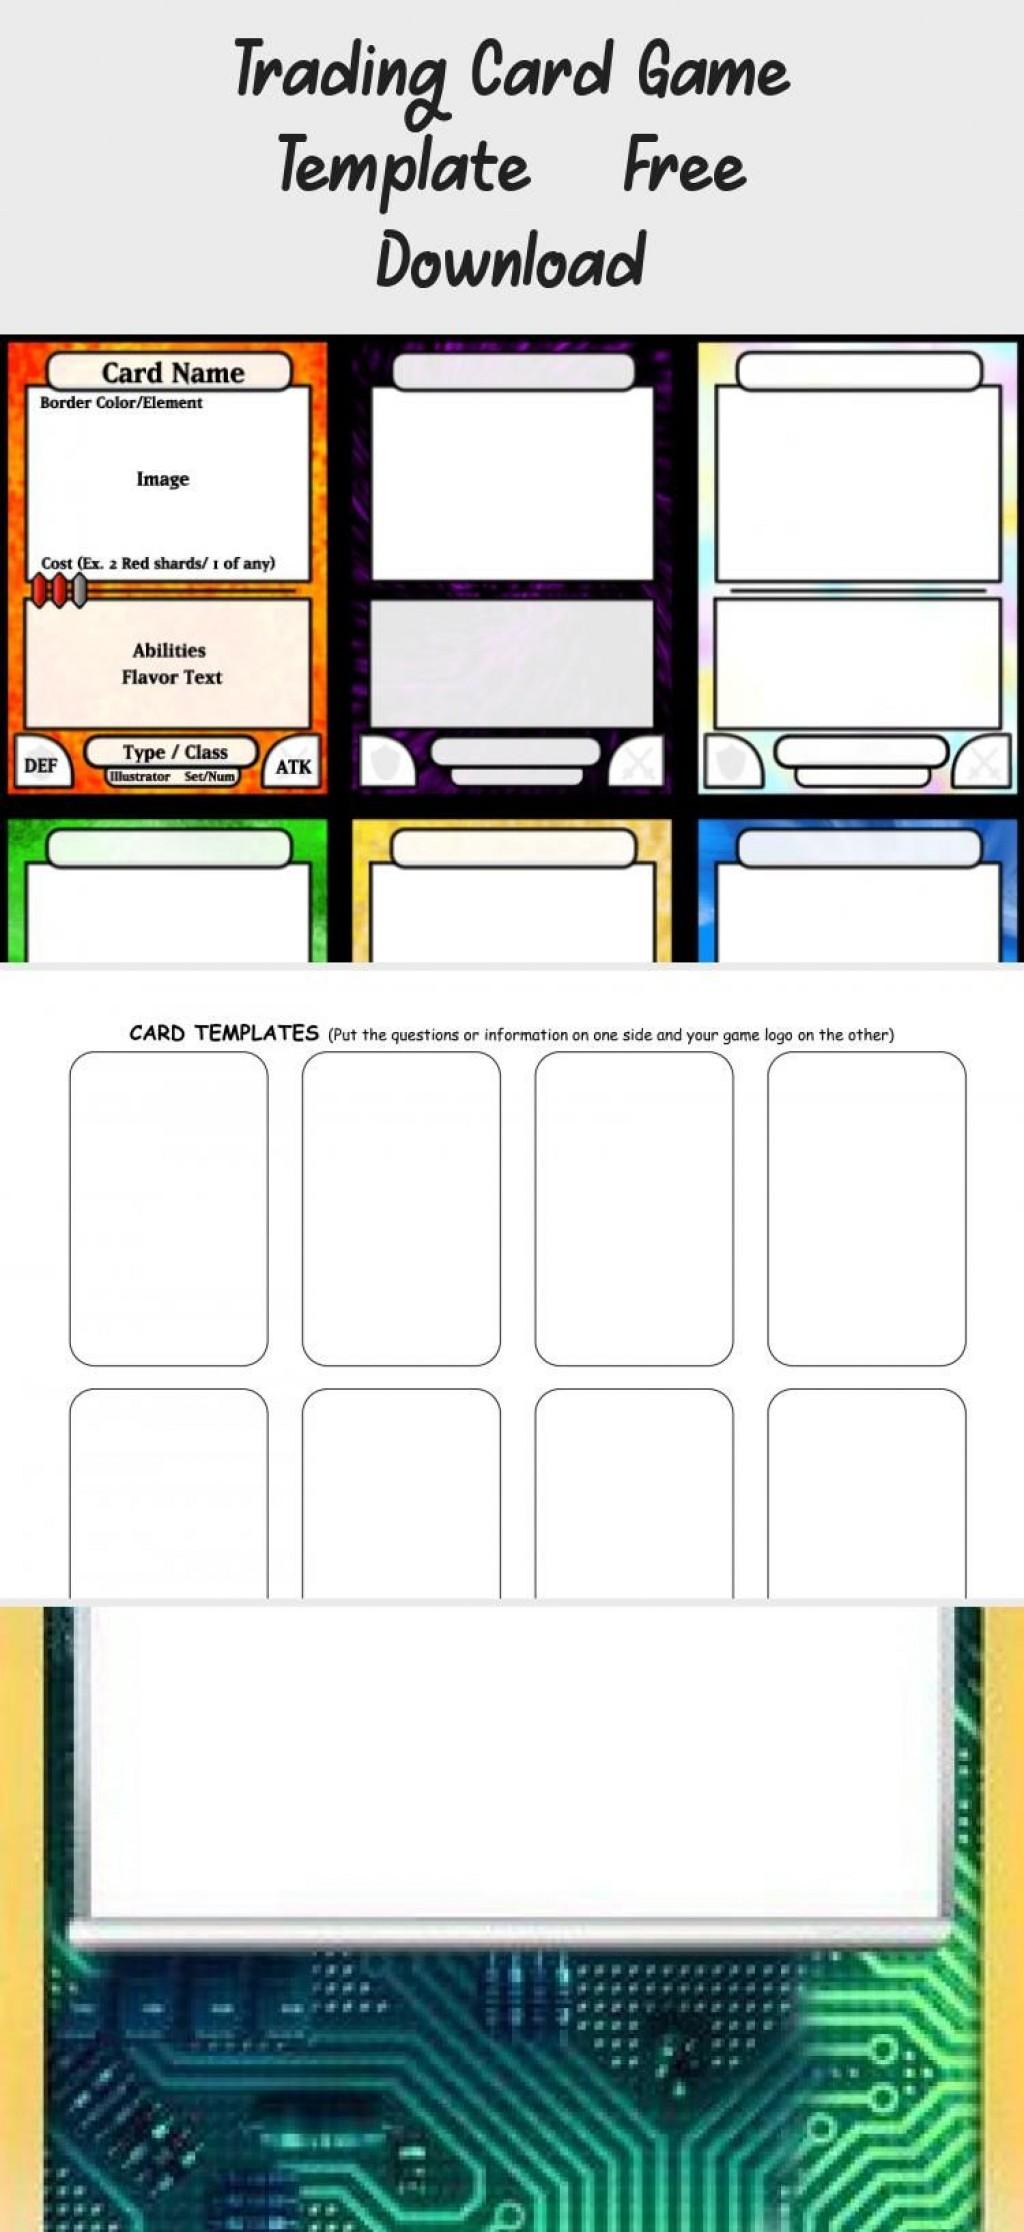 002 Incredible Trading Card Template Free Design  Game Maker DownloadLarge